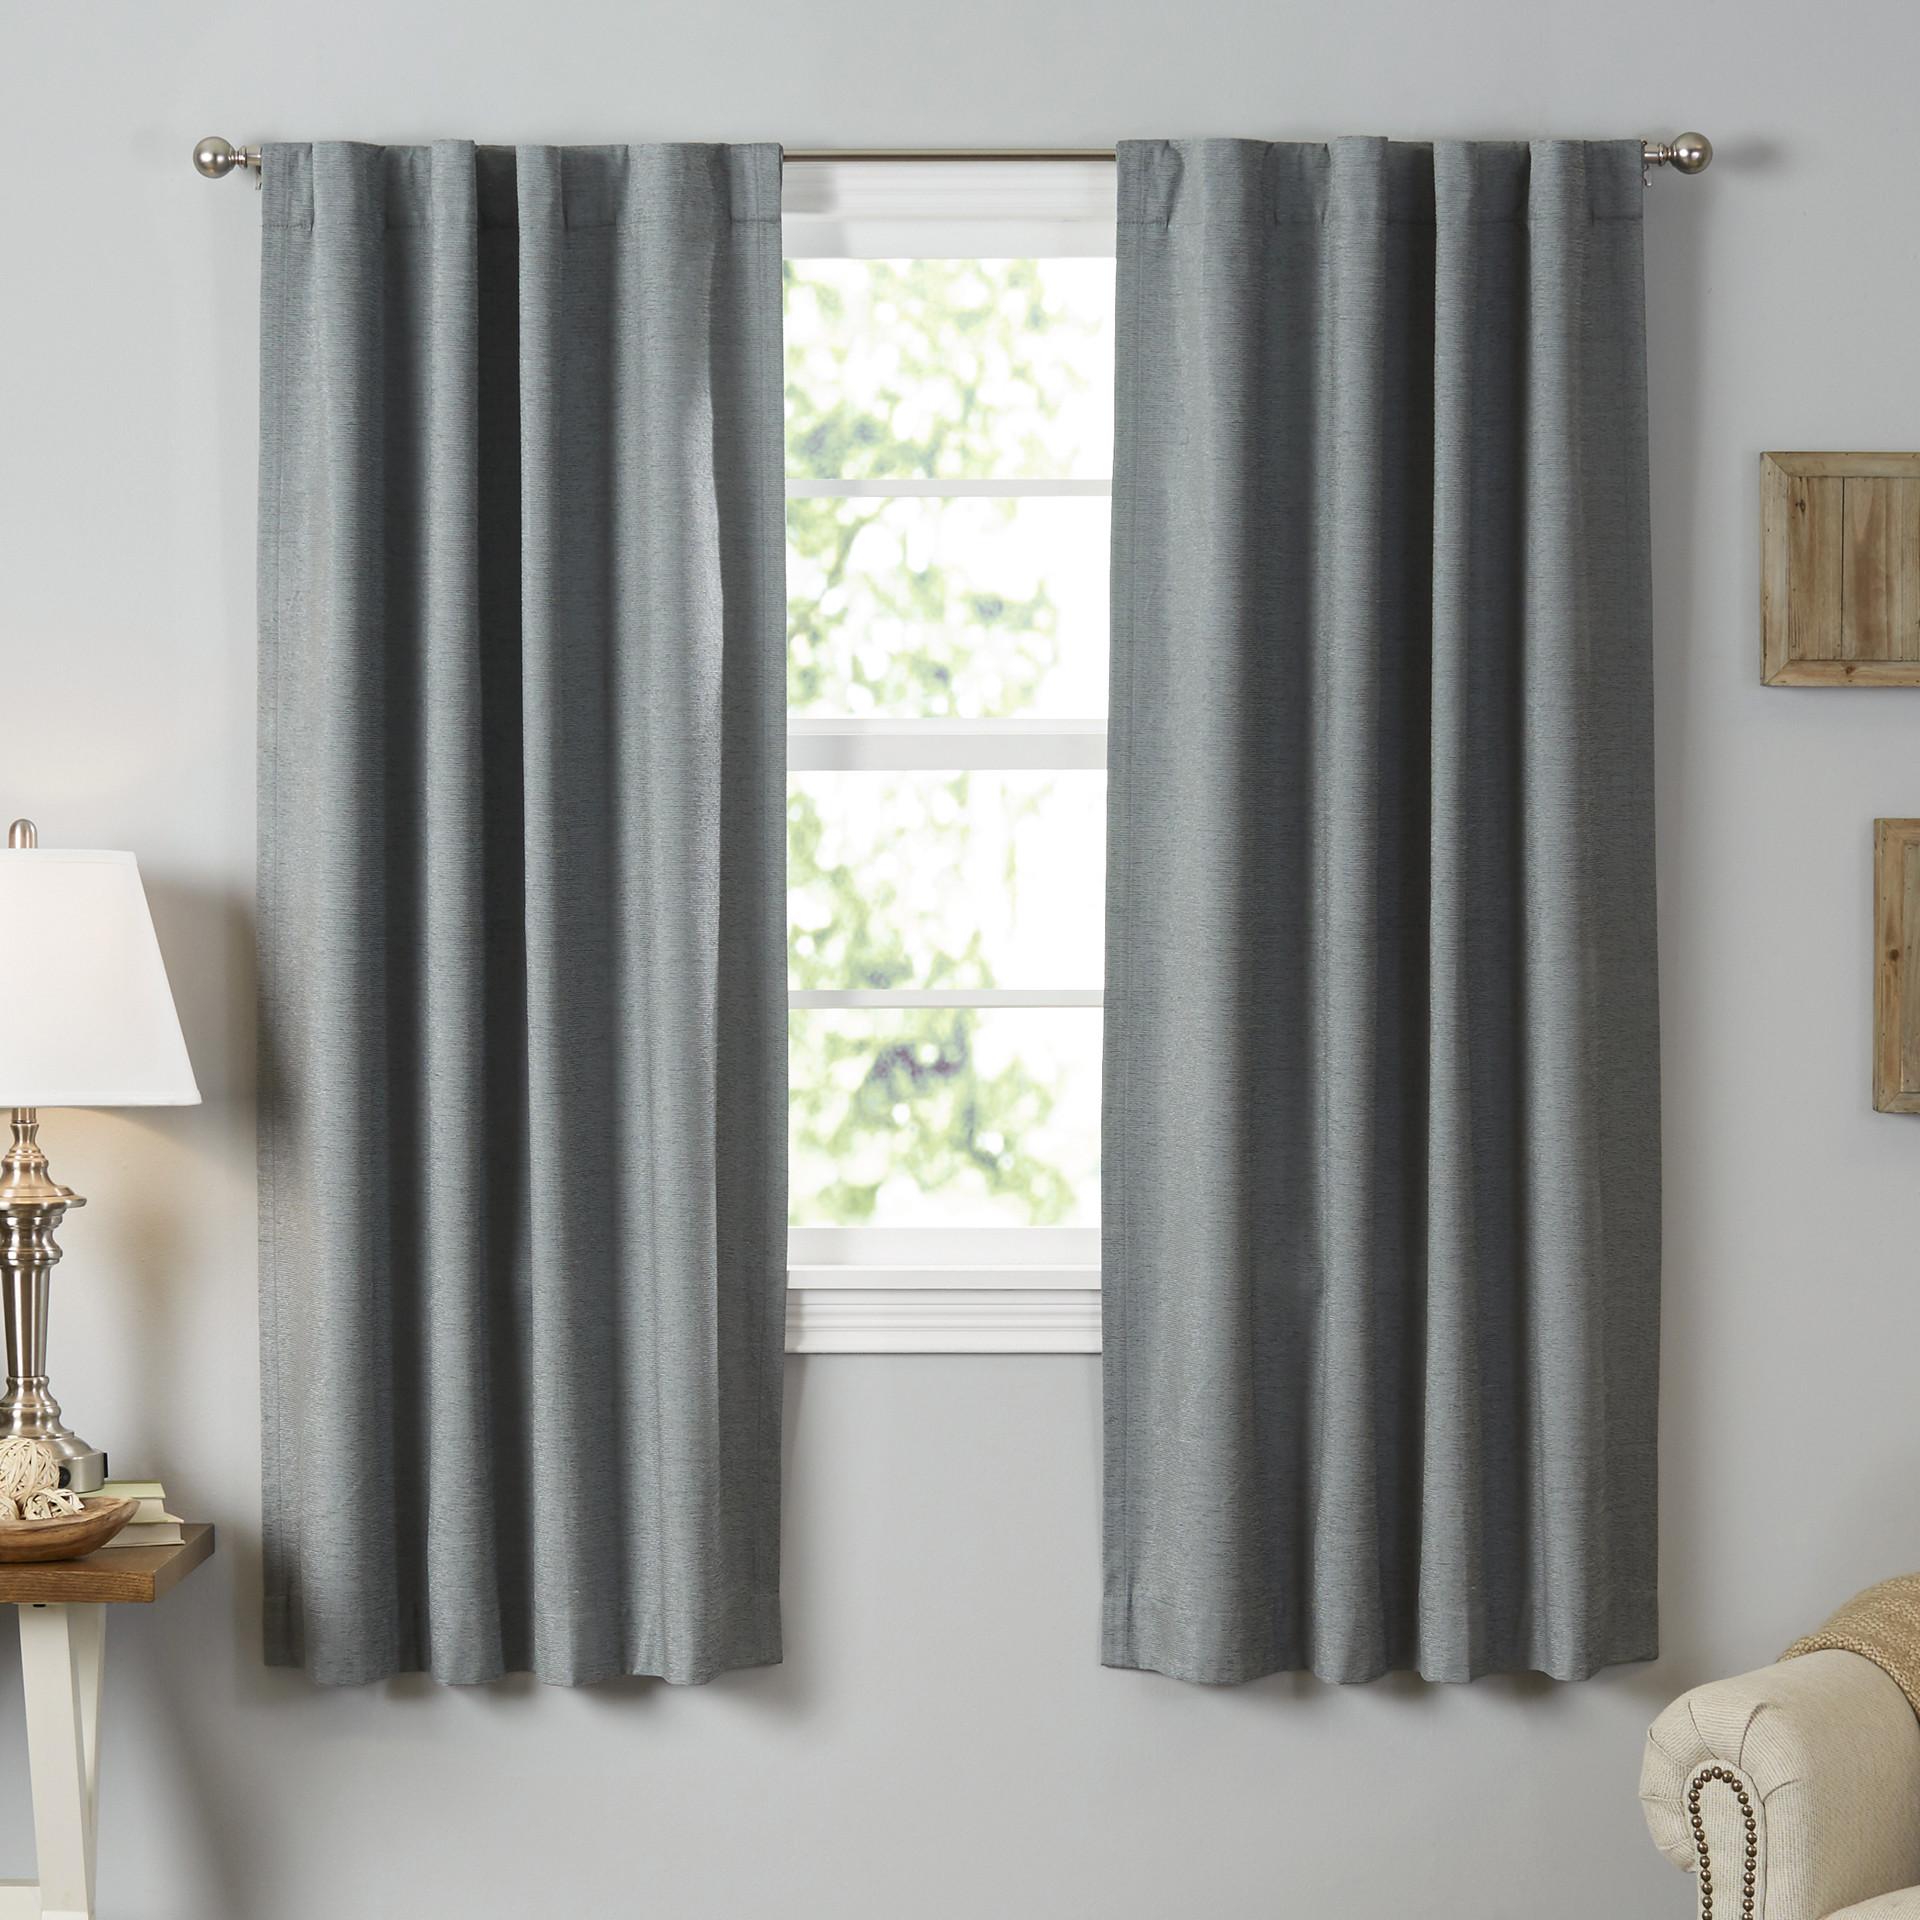 Blackout Cloth Walmart | Teal Curtains Target | Soundproof Curtains Target